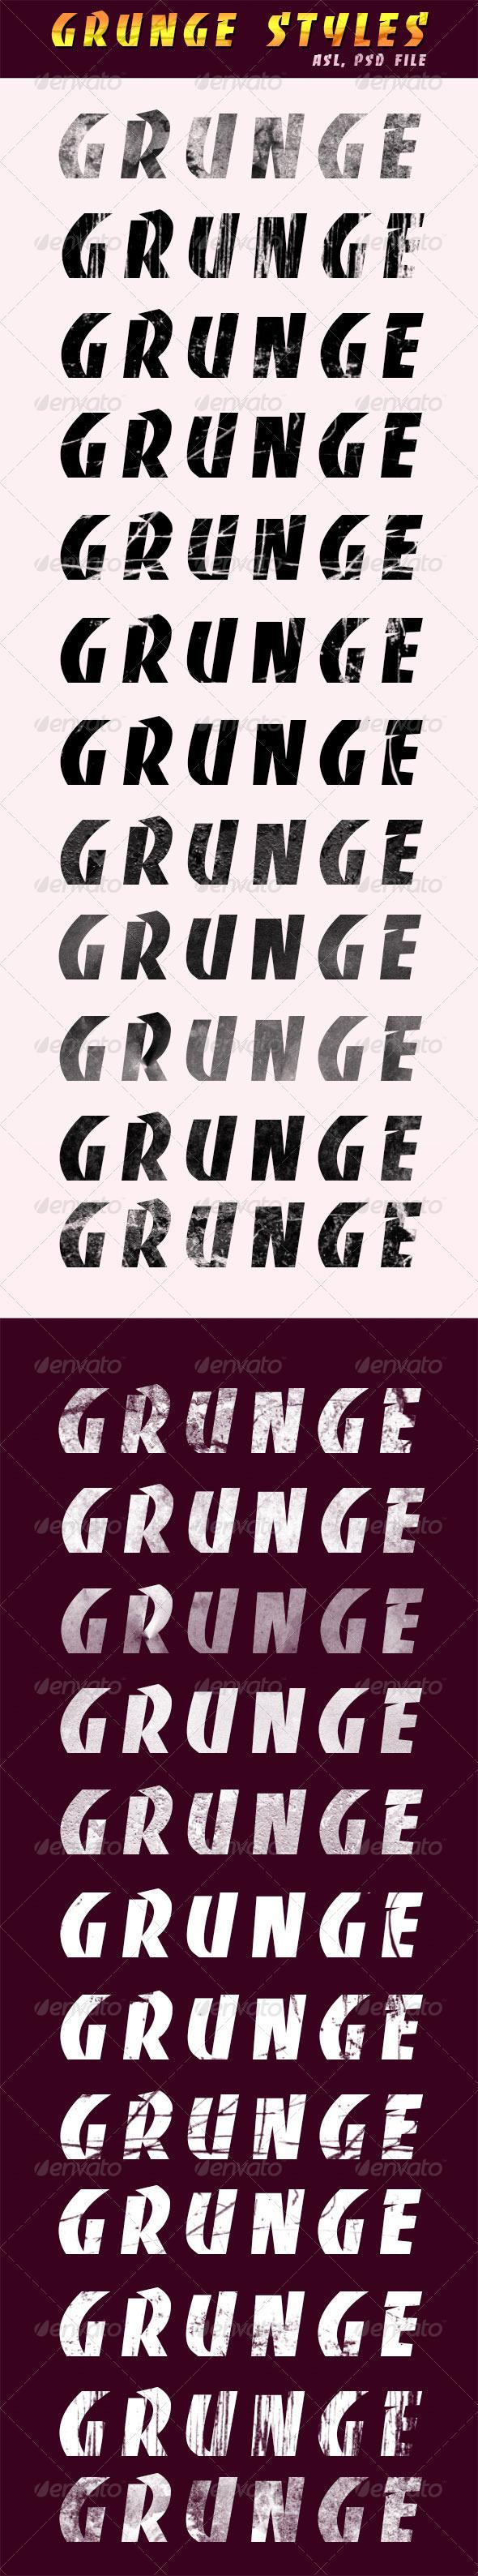 GraphicRiver 24 Grunge Styles 8492670